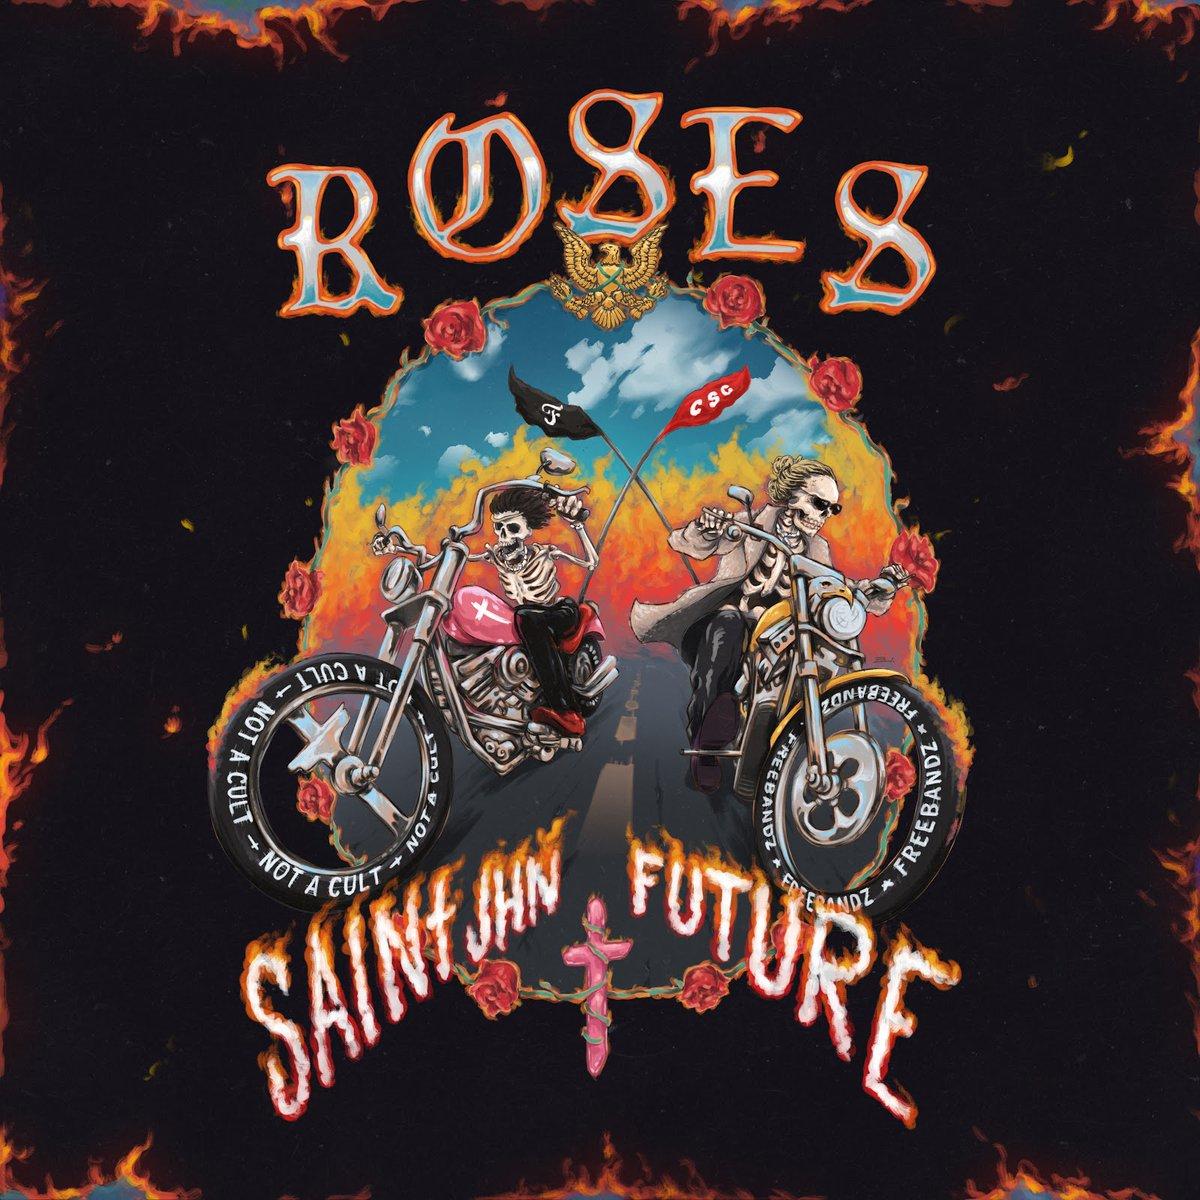 .@1future joins @SAINtJHN for remix of international smash #ROSES bit.ly/3eyQRZN